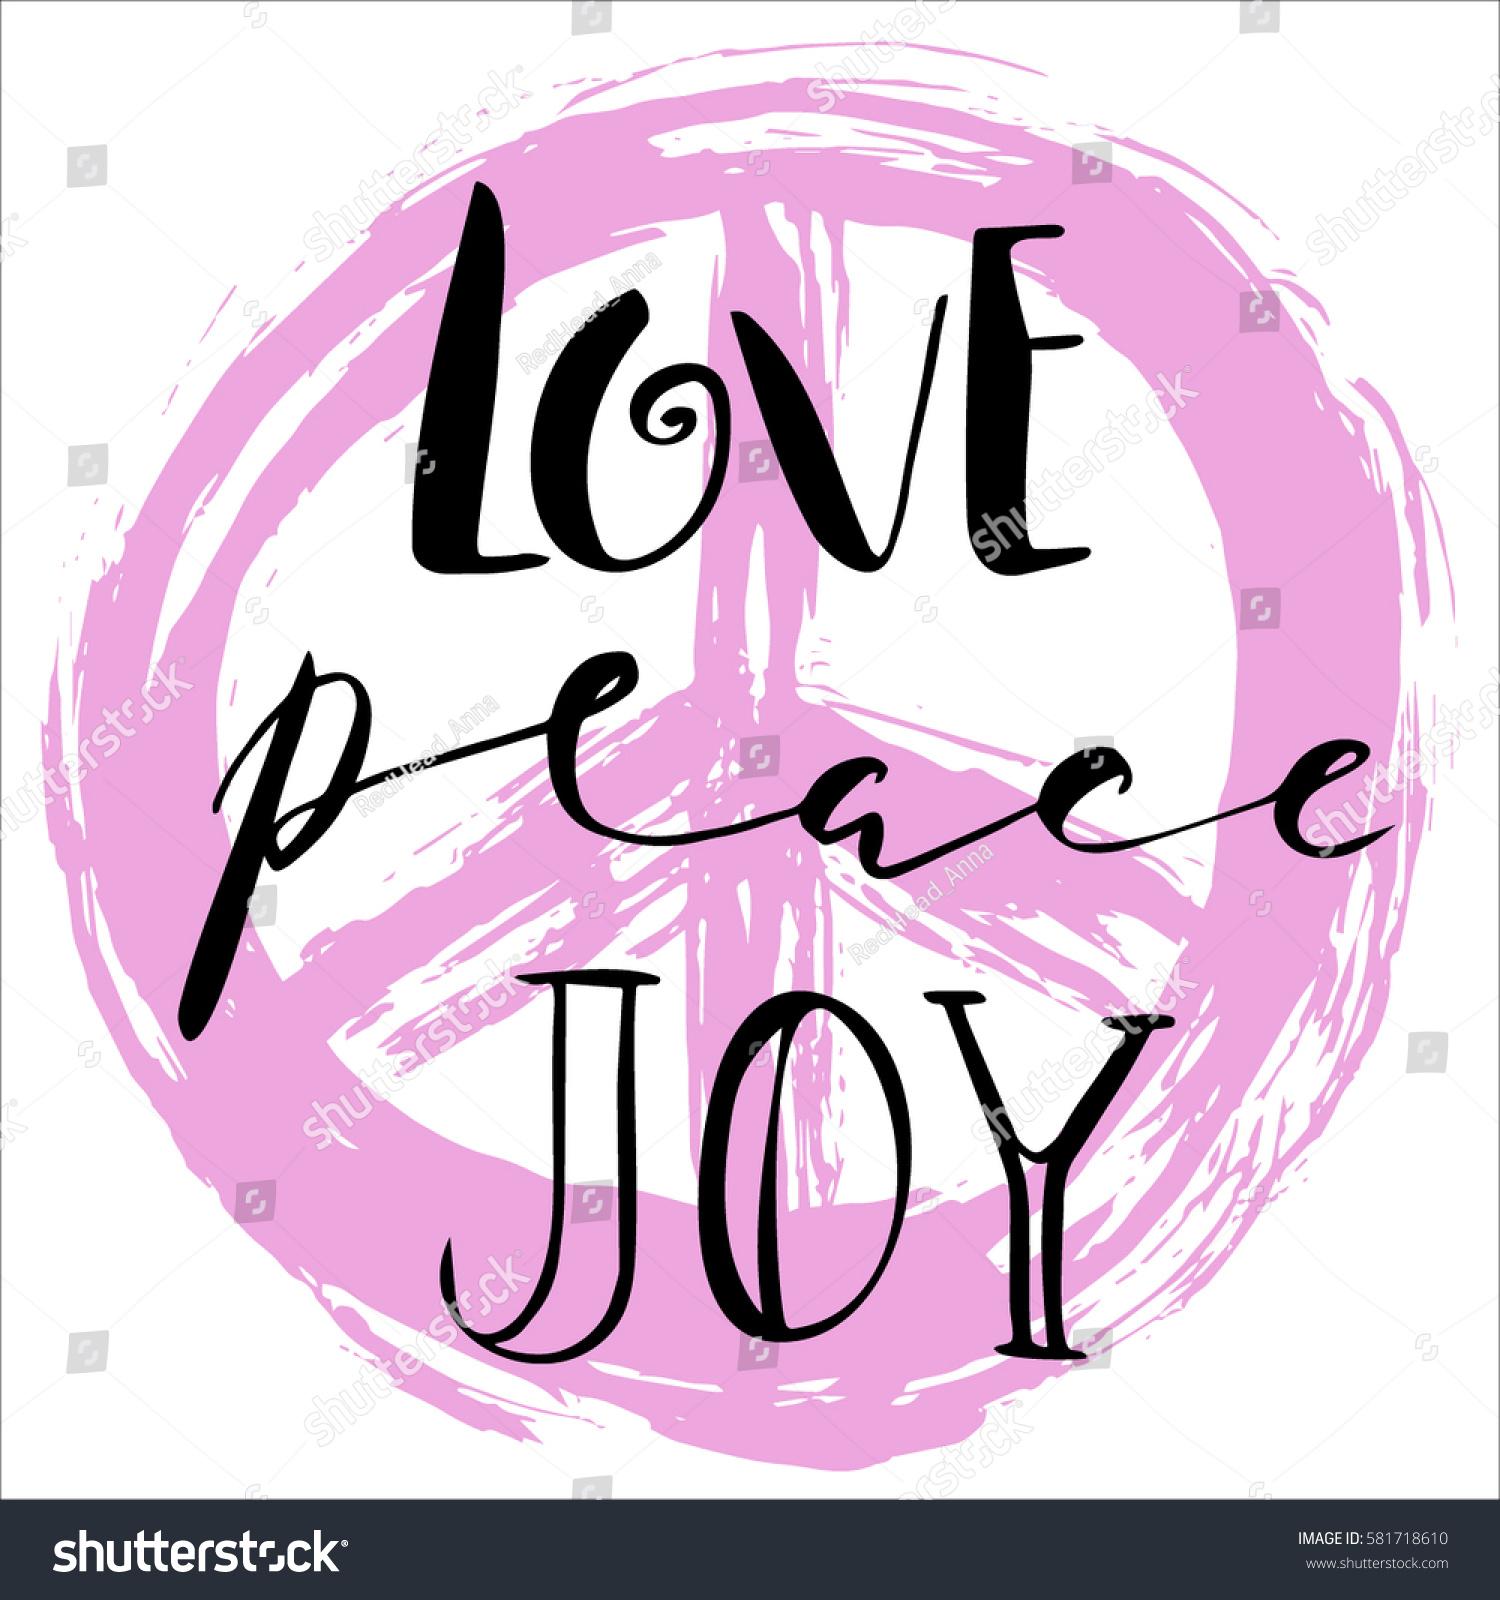 Peace Love Joy Quotes Love Peace Joy Quotestexthand Drawn Brush Stock Vector 581718610